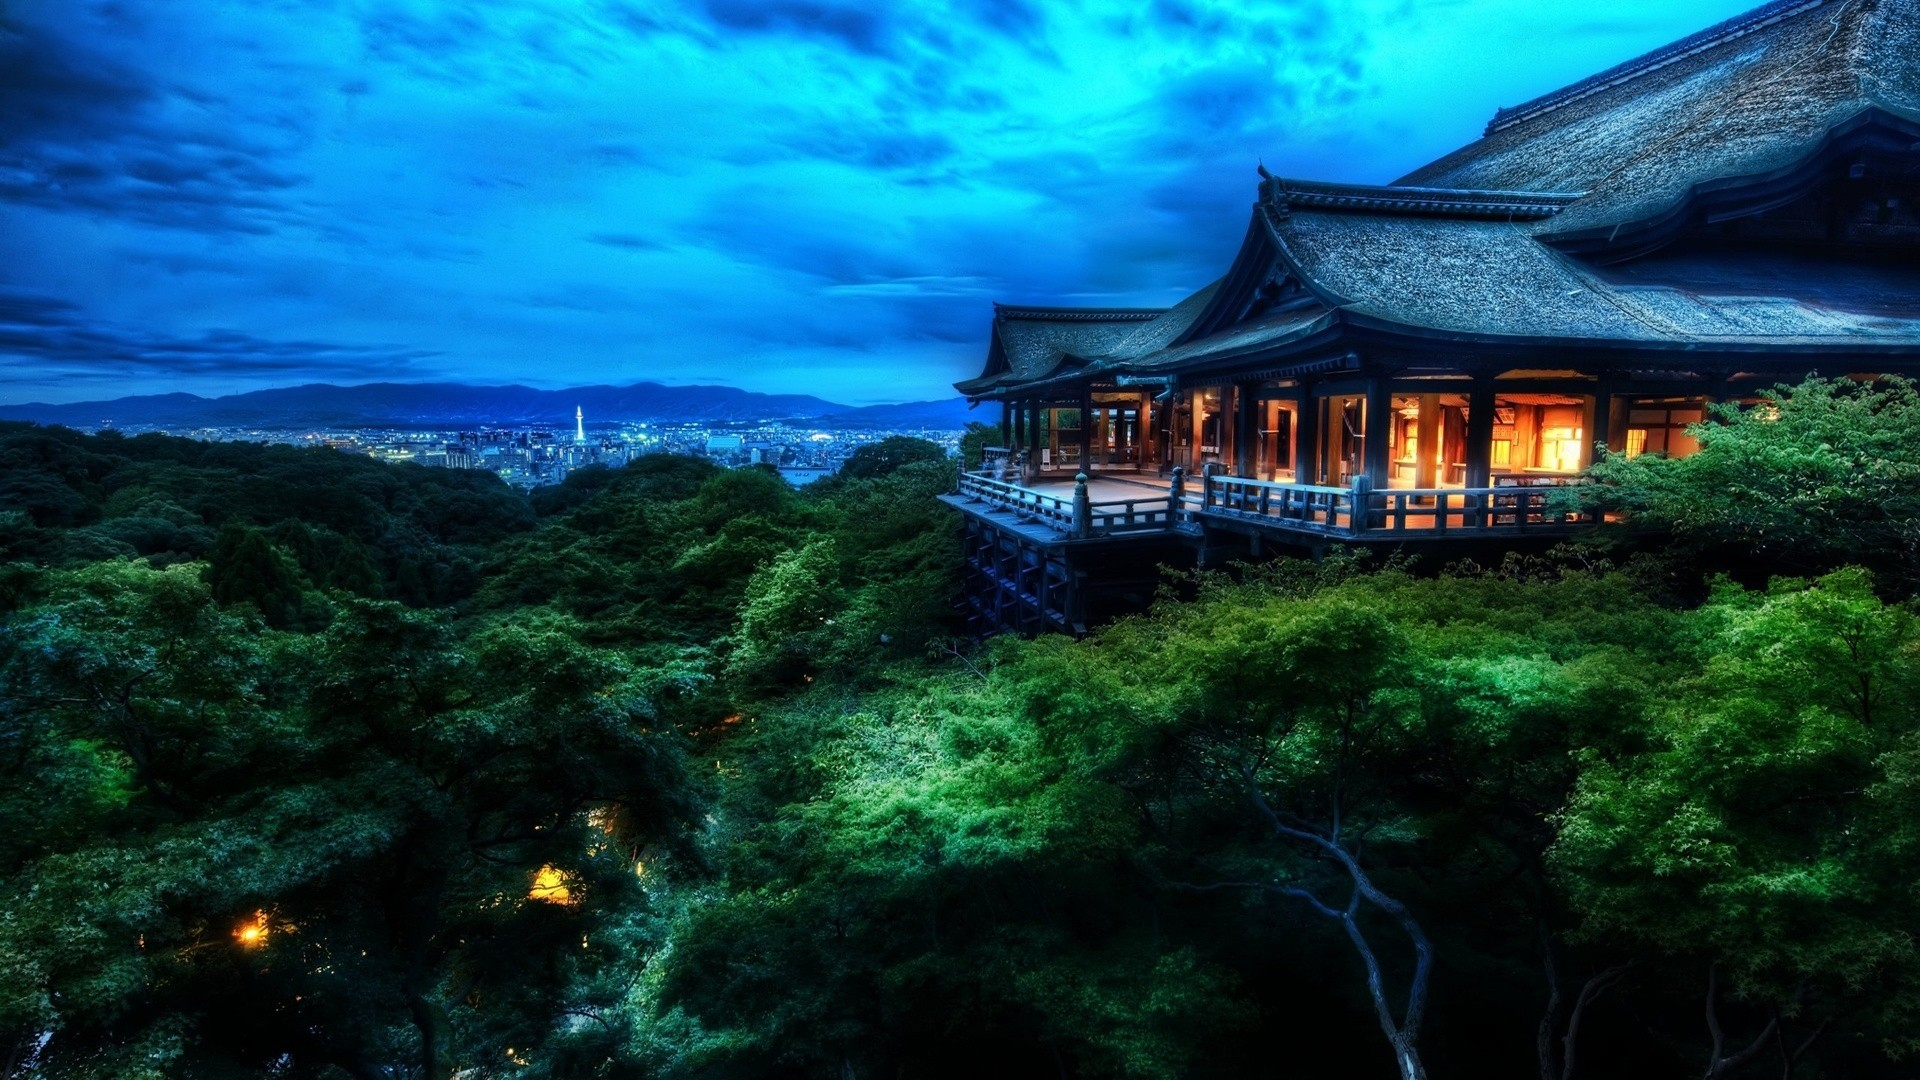 Japan Night Landscape Wallpaper HD #10770 Wallpaper   WallpaperLepi